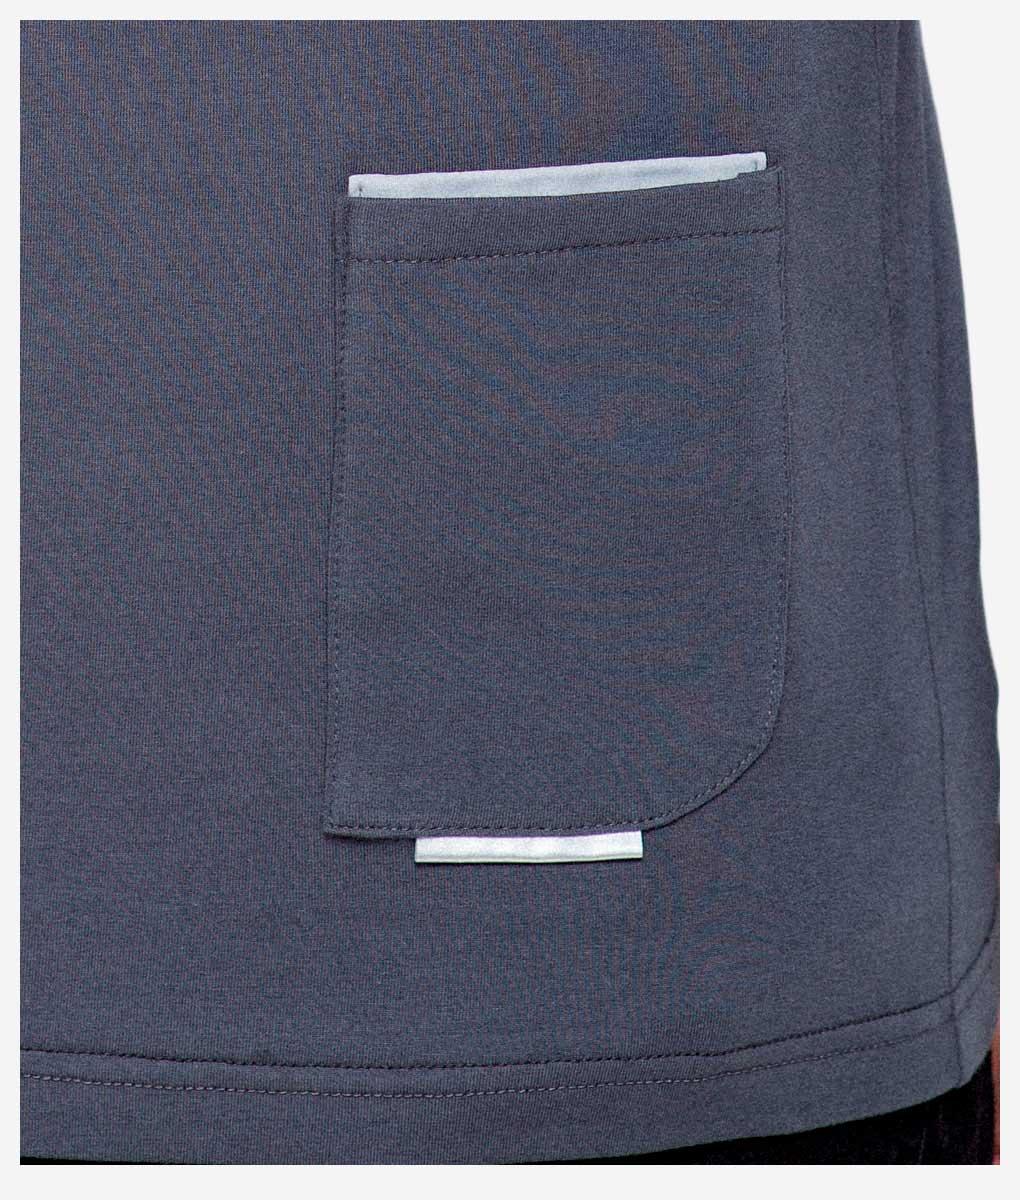 Transparent-casual-cycling-titanium-classic-back-pocket-detail